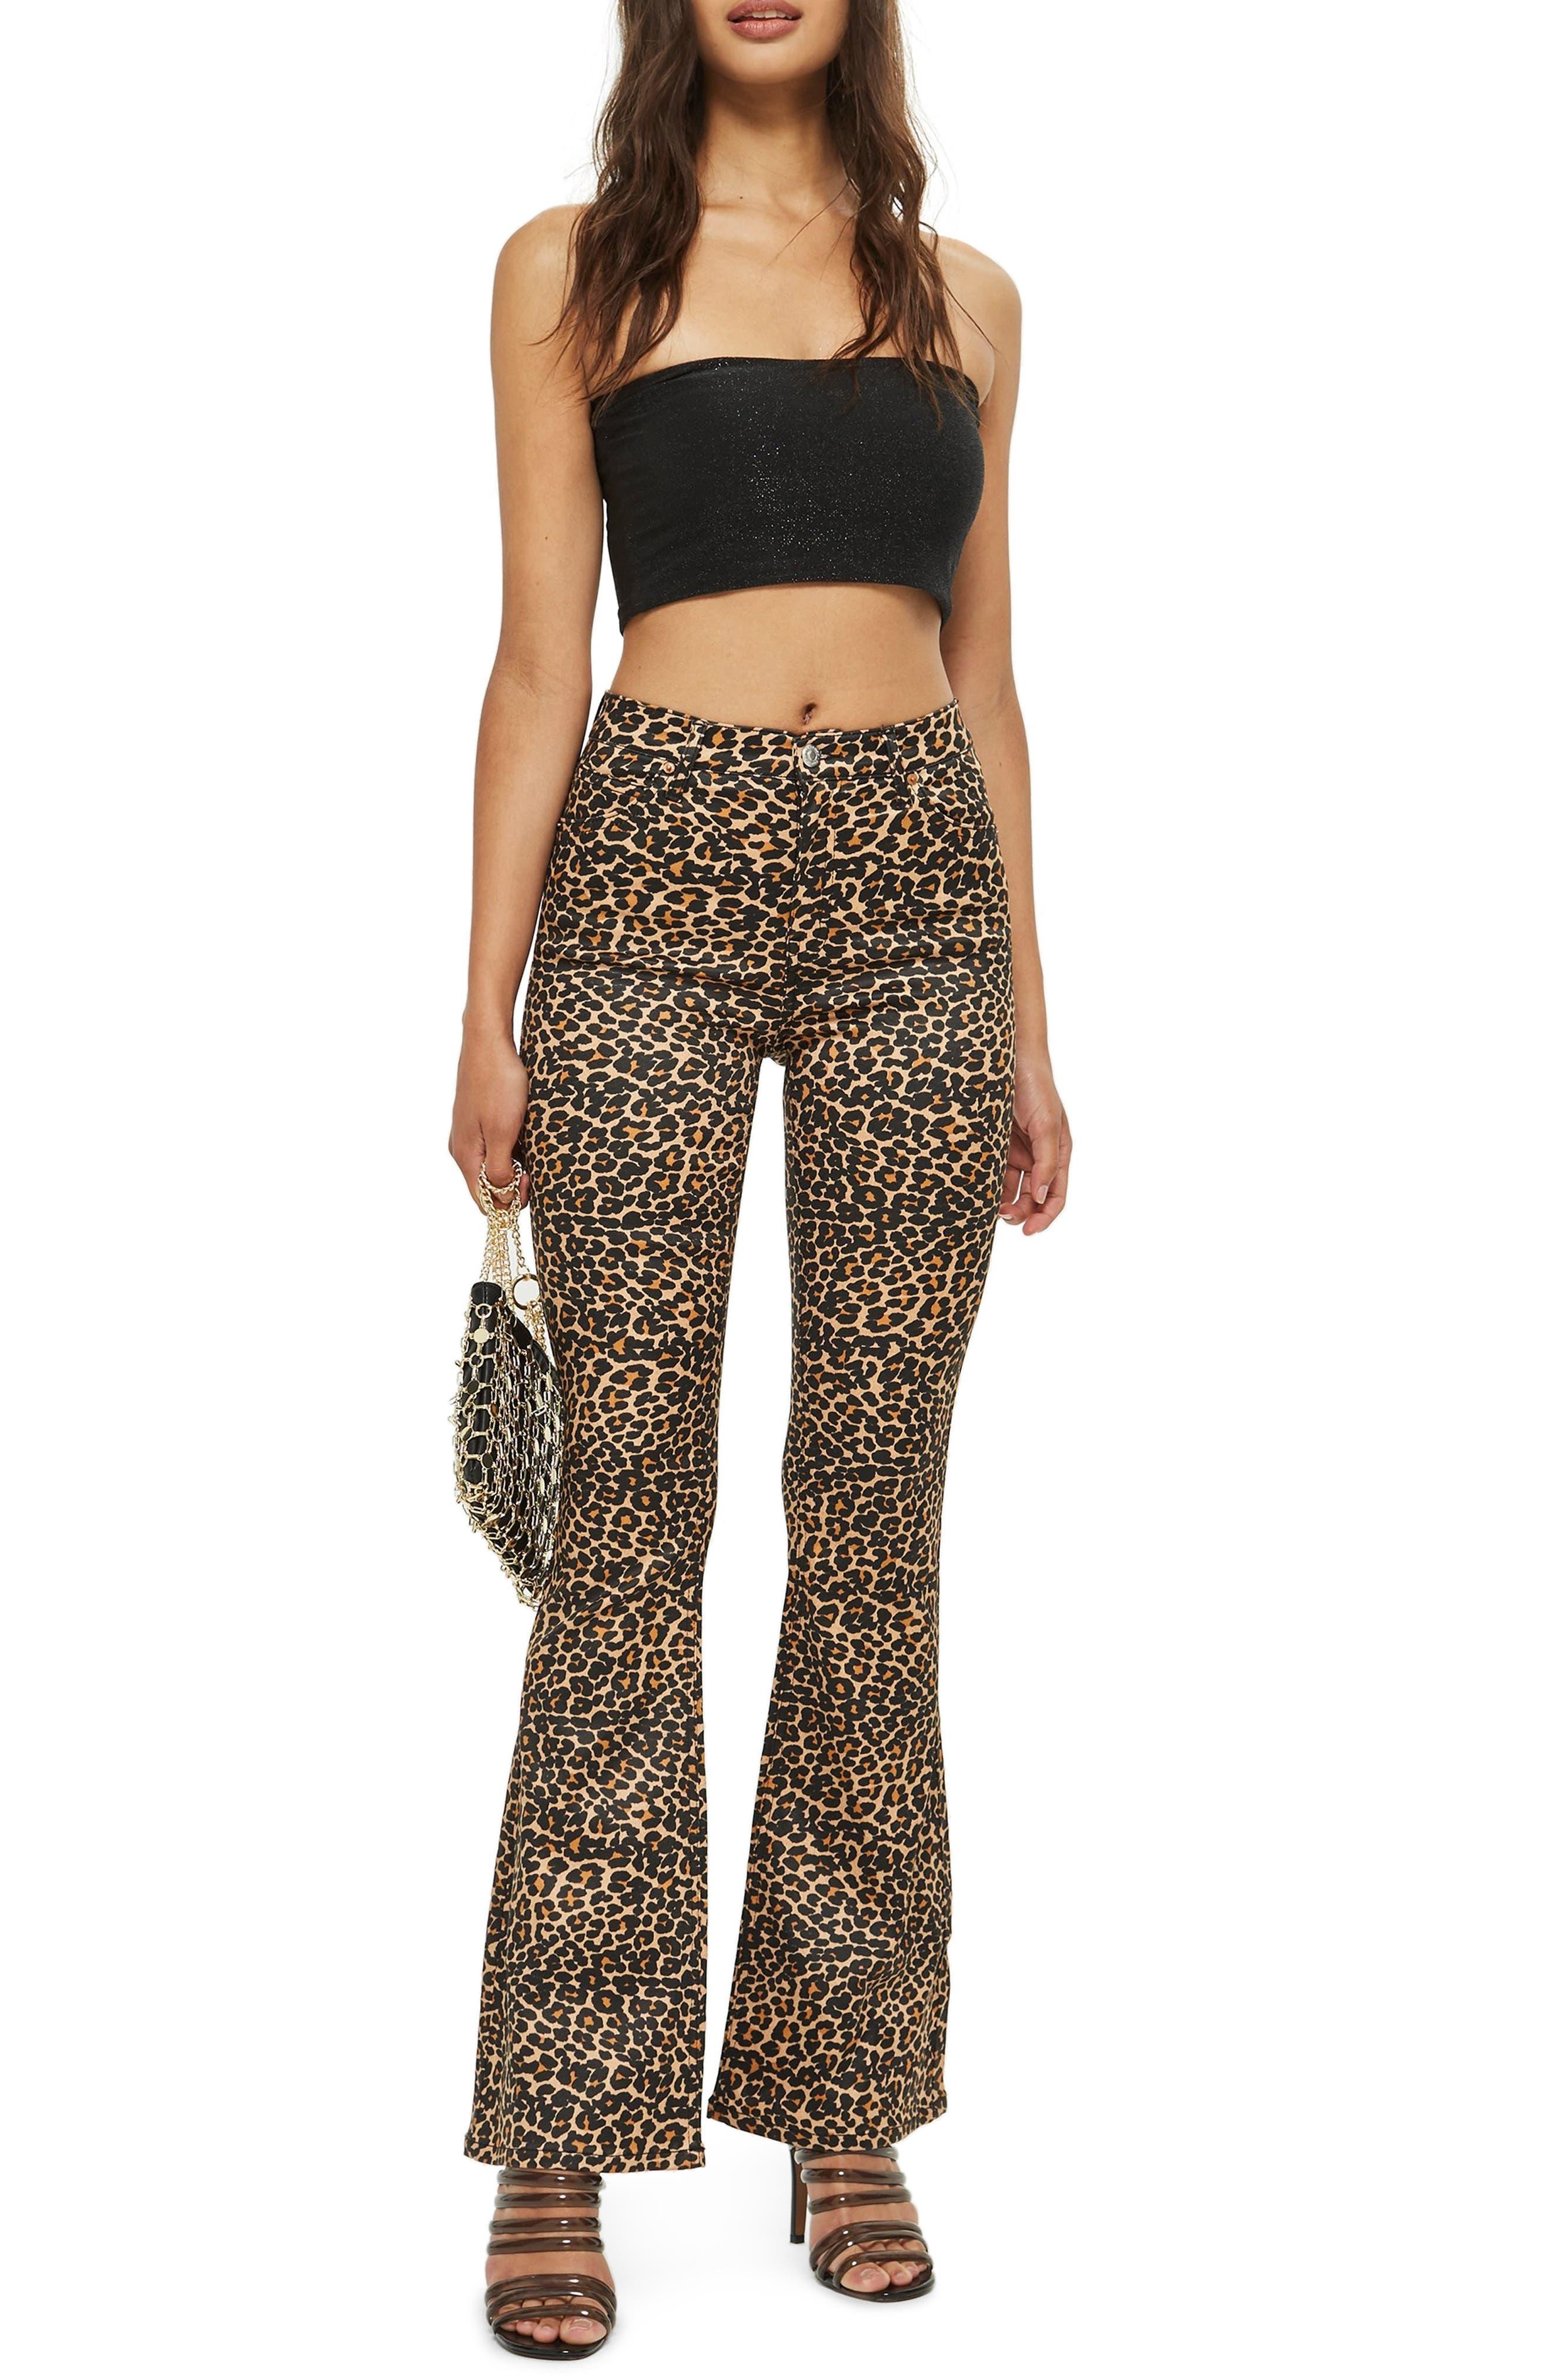 MOTO Leopard Print Flare Jeans,                         Main,                         color, BROWN MULTI